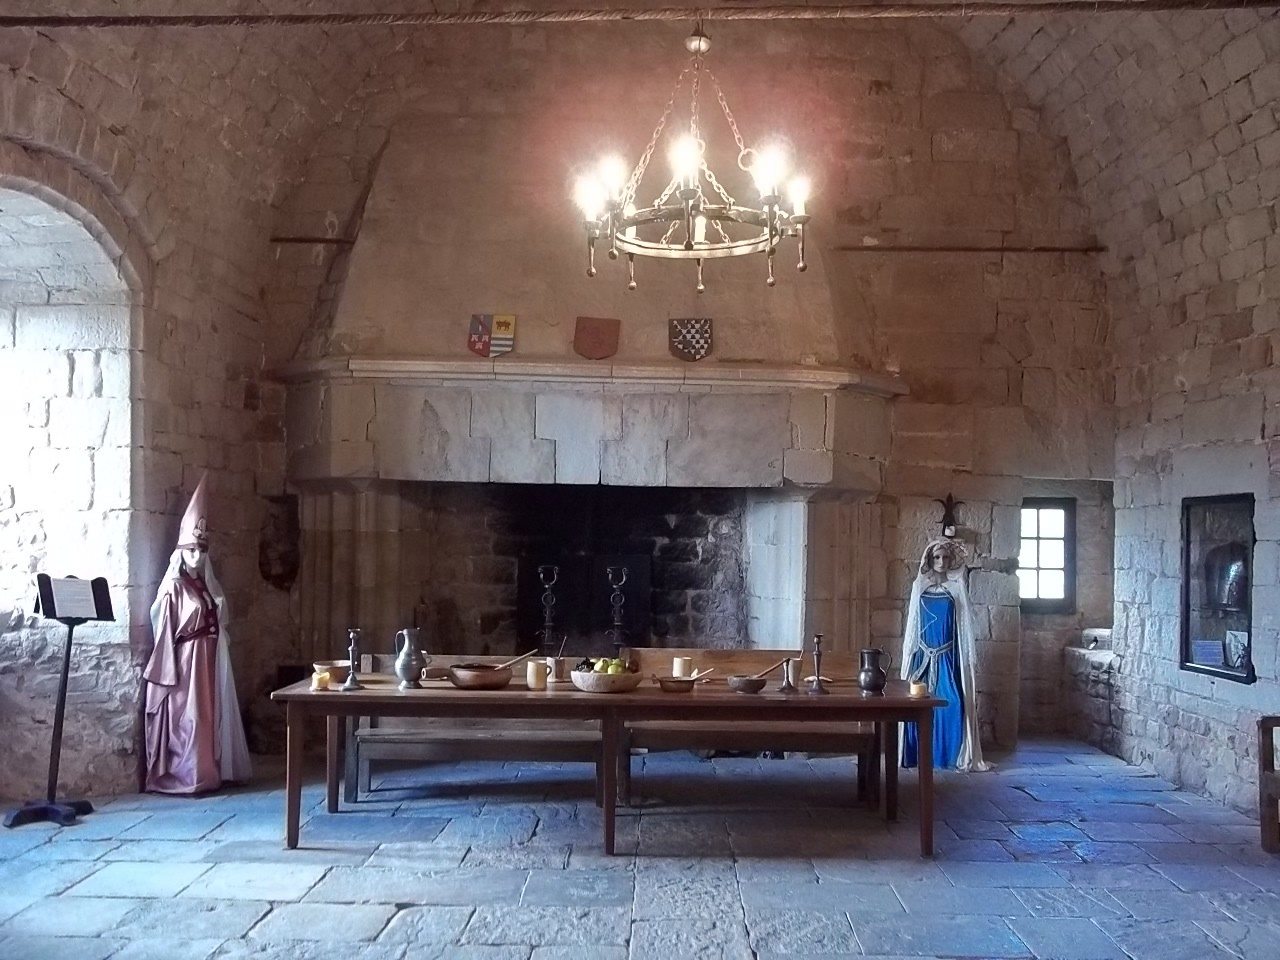 Der Große Saal des Burgherren